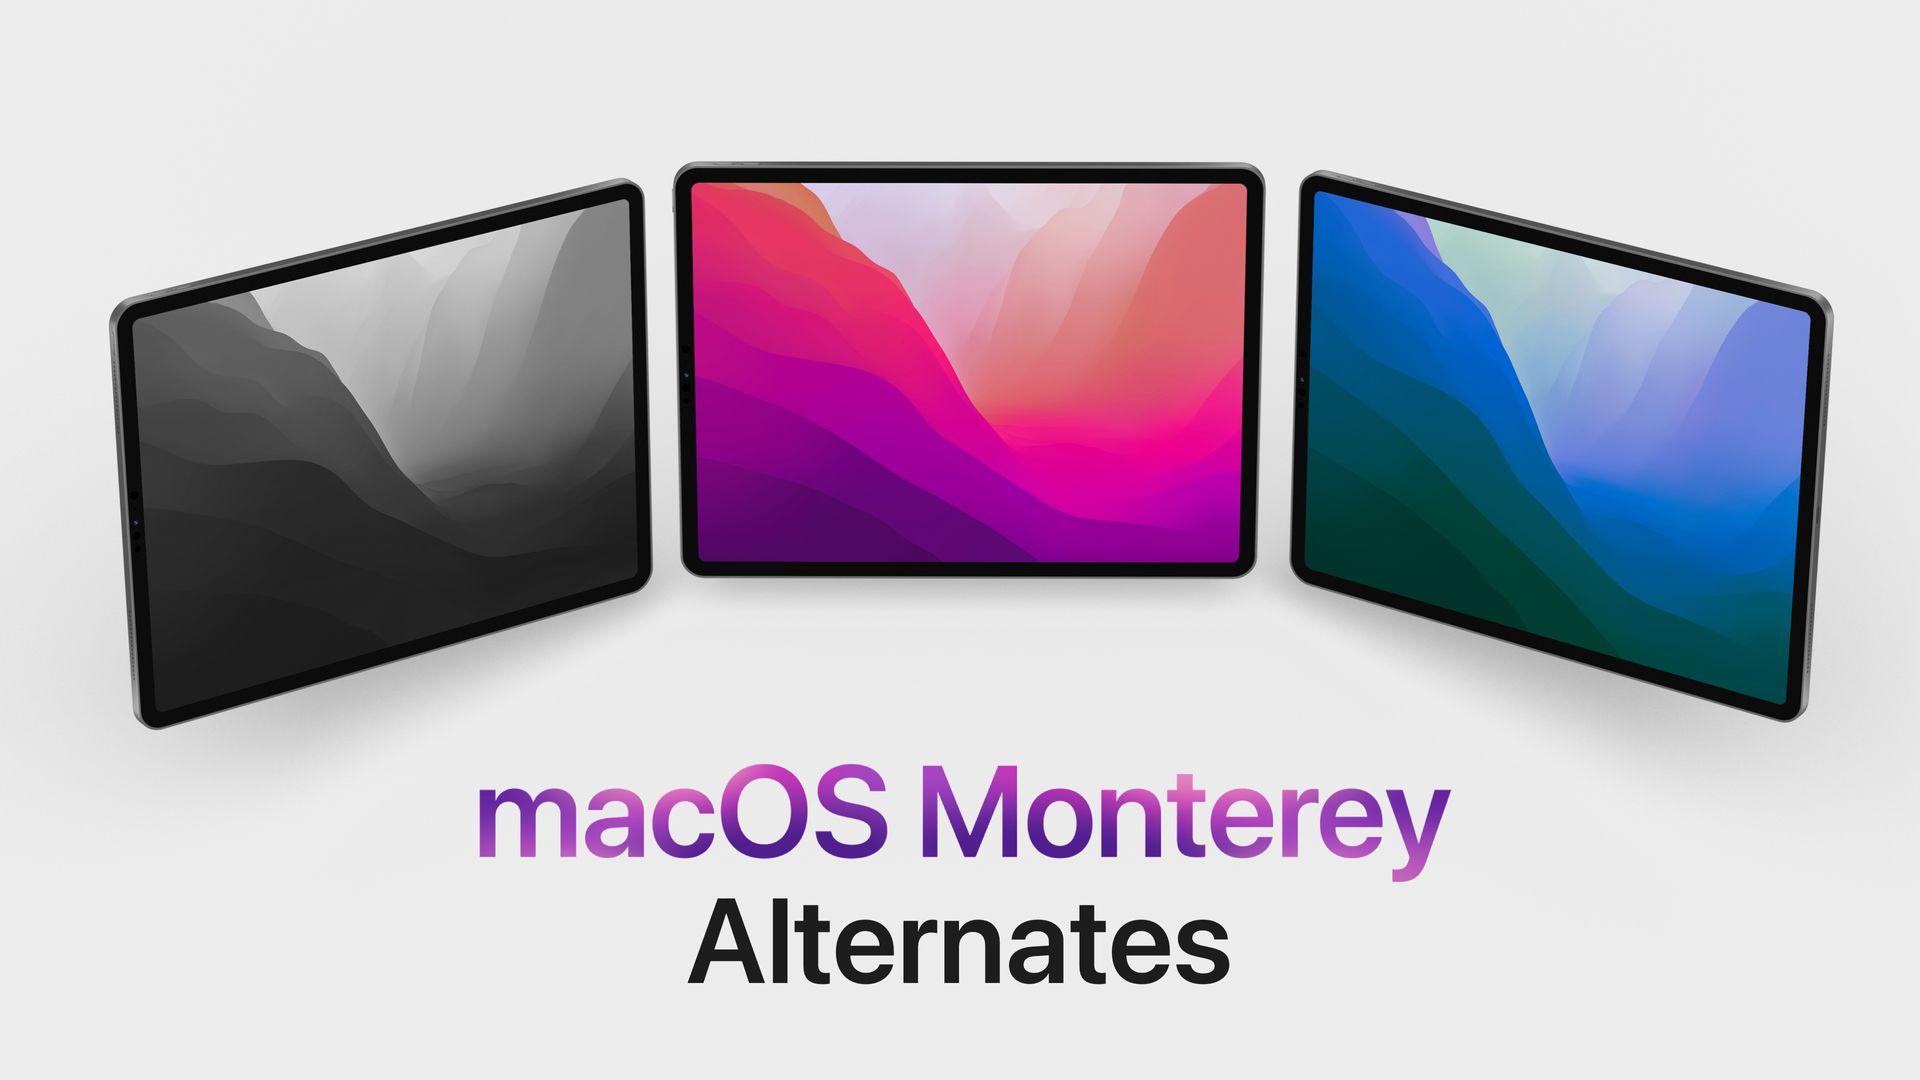 macOS Monterey wallpaper variations in light and dark mode